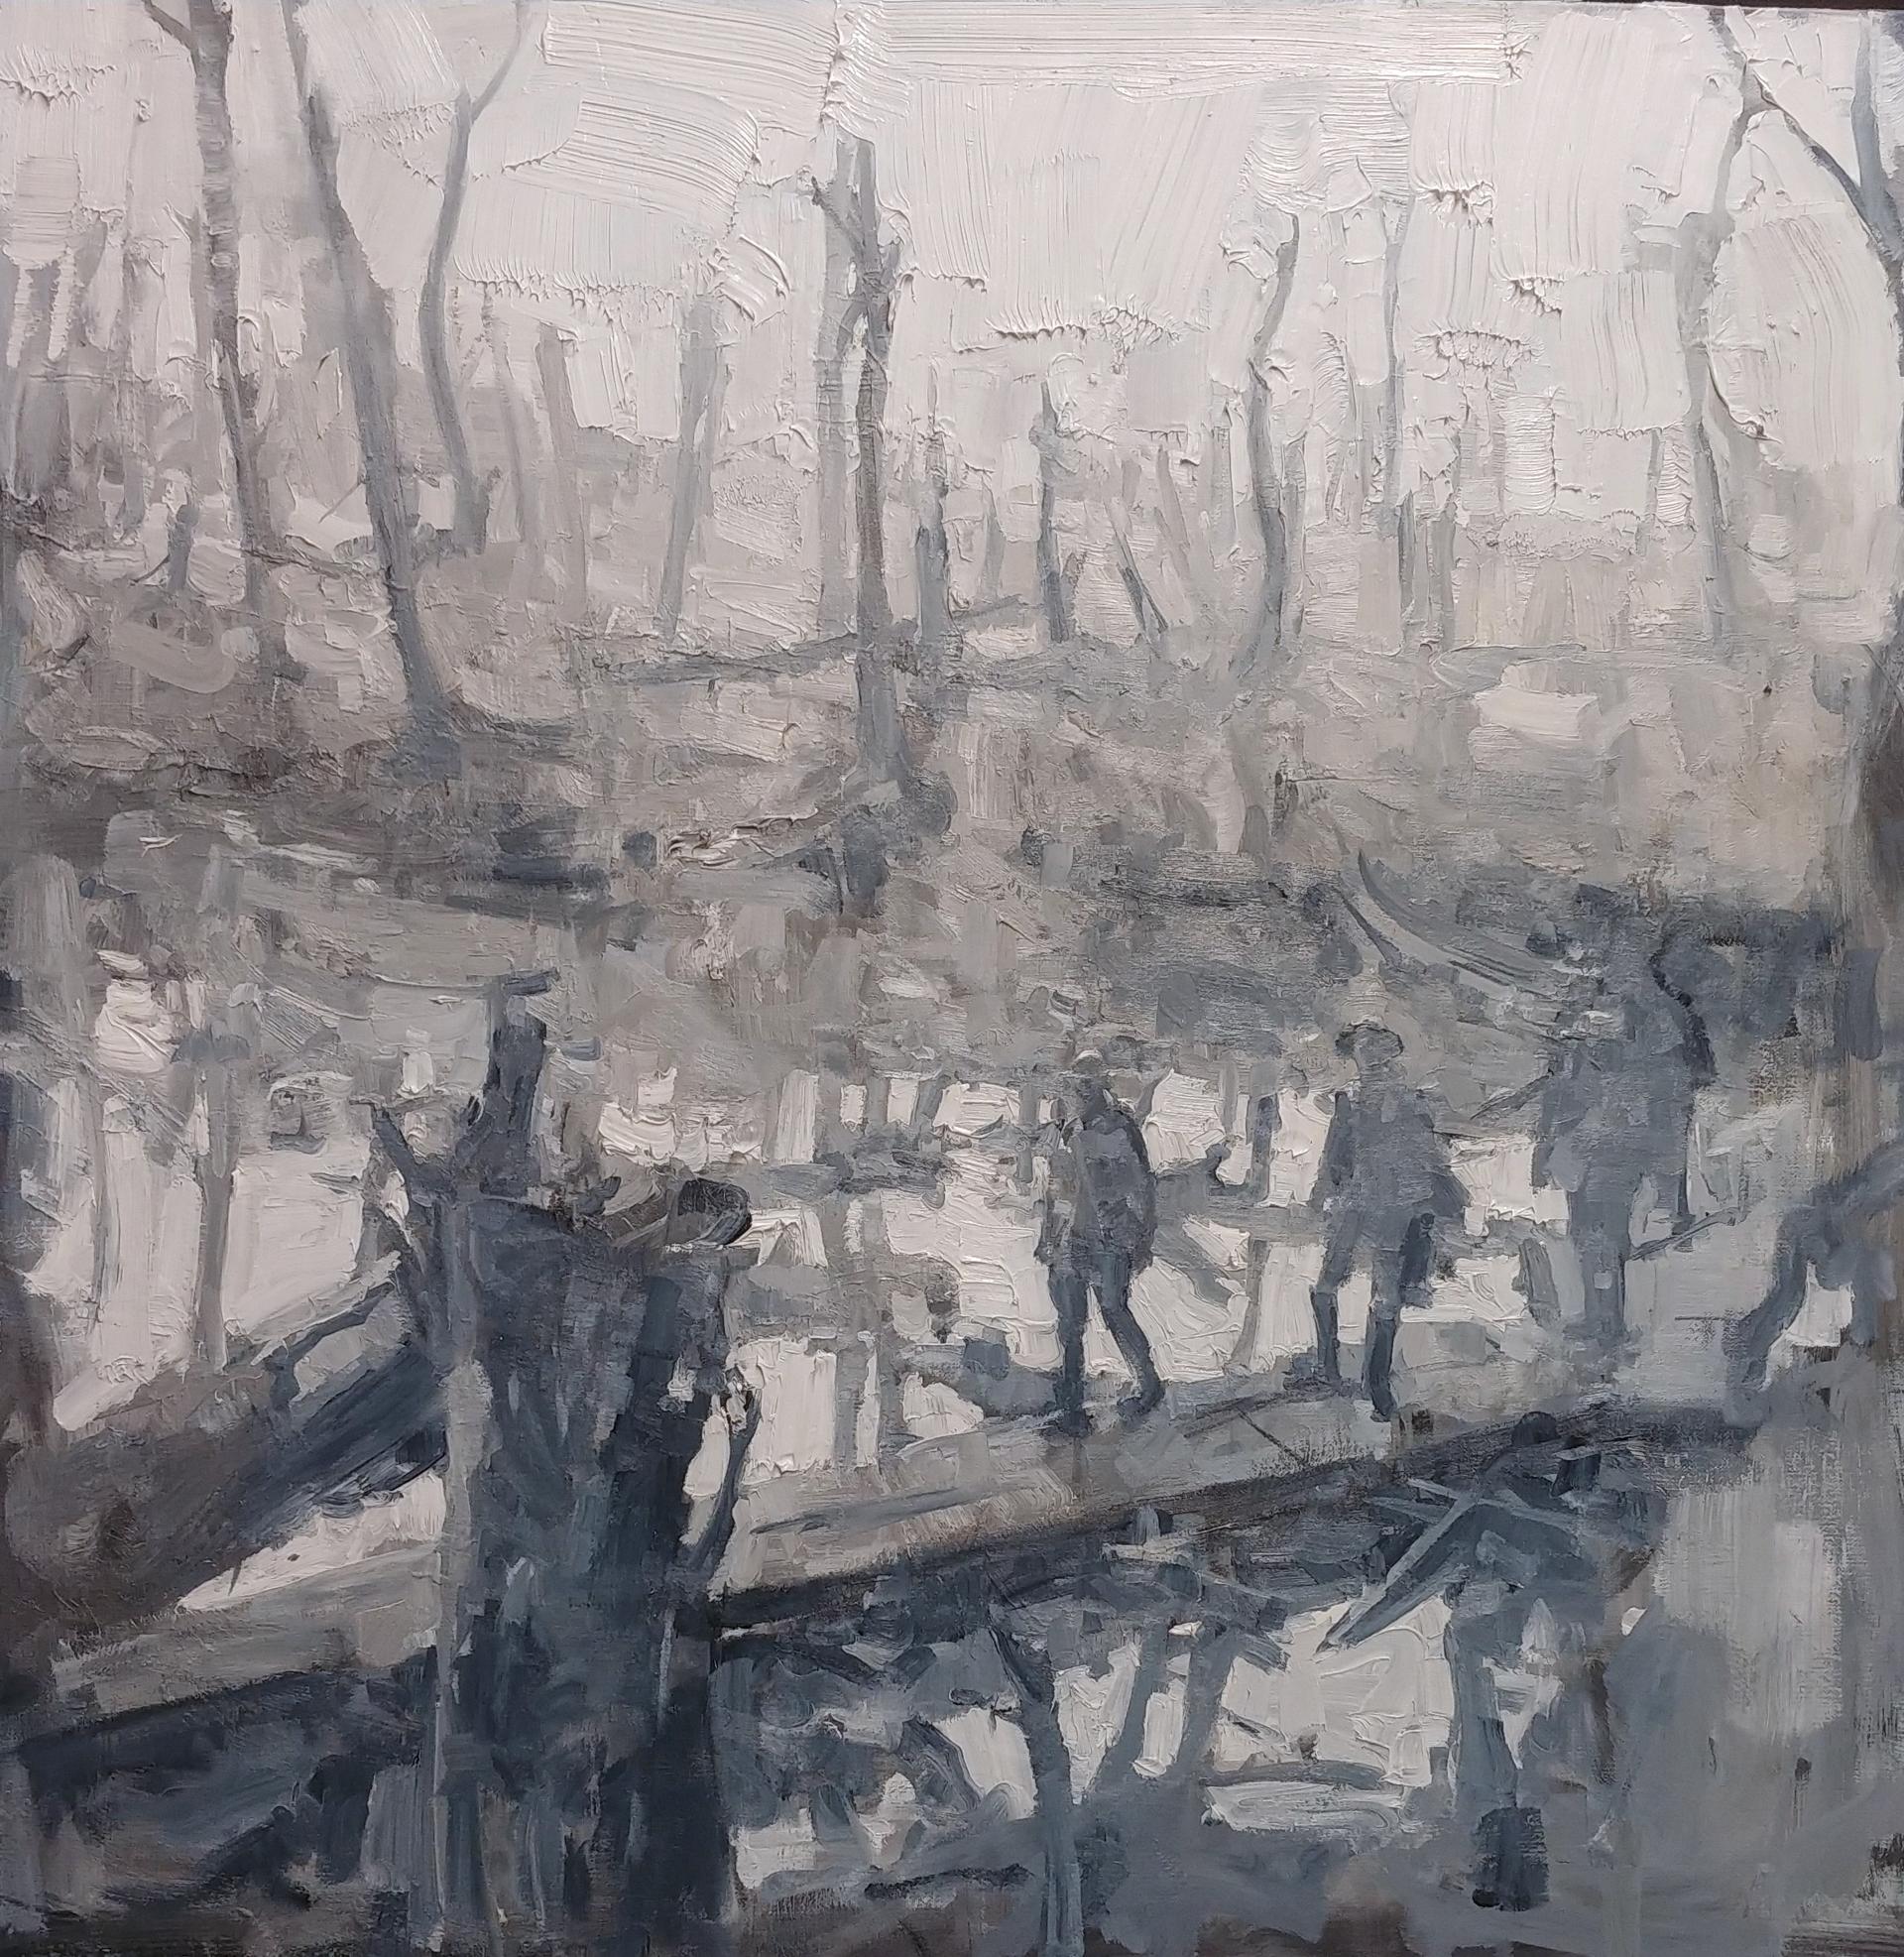 A Century Ago by Mikael Olson